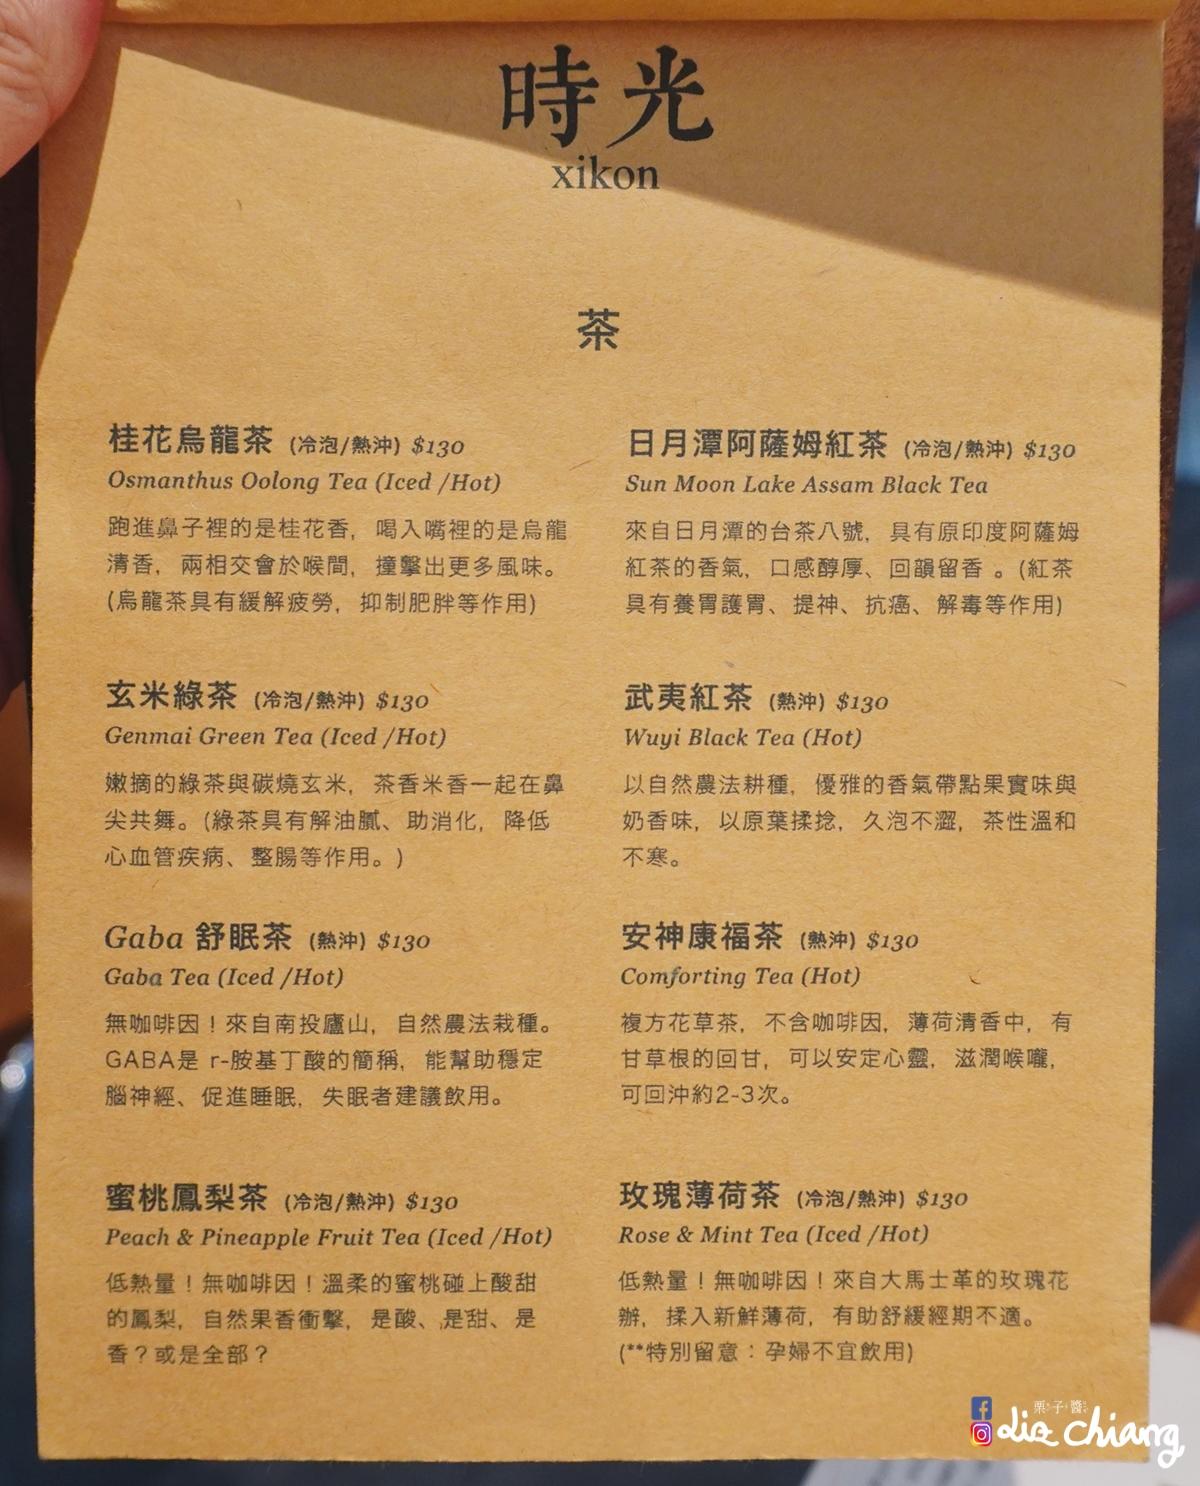 DSC01822Liz chiang 栗子醬-美食部落客-料理部落客